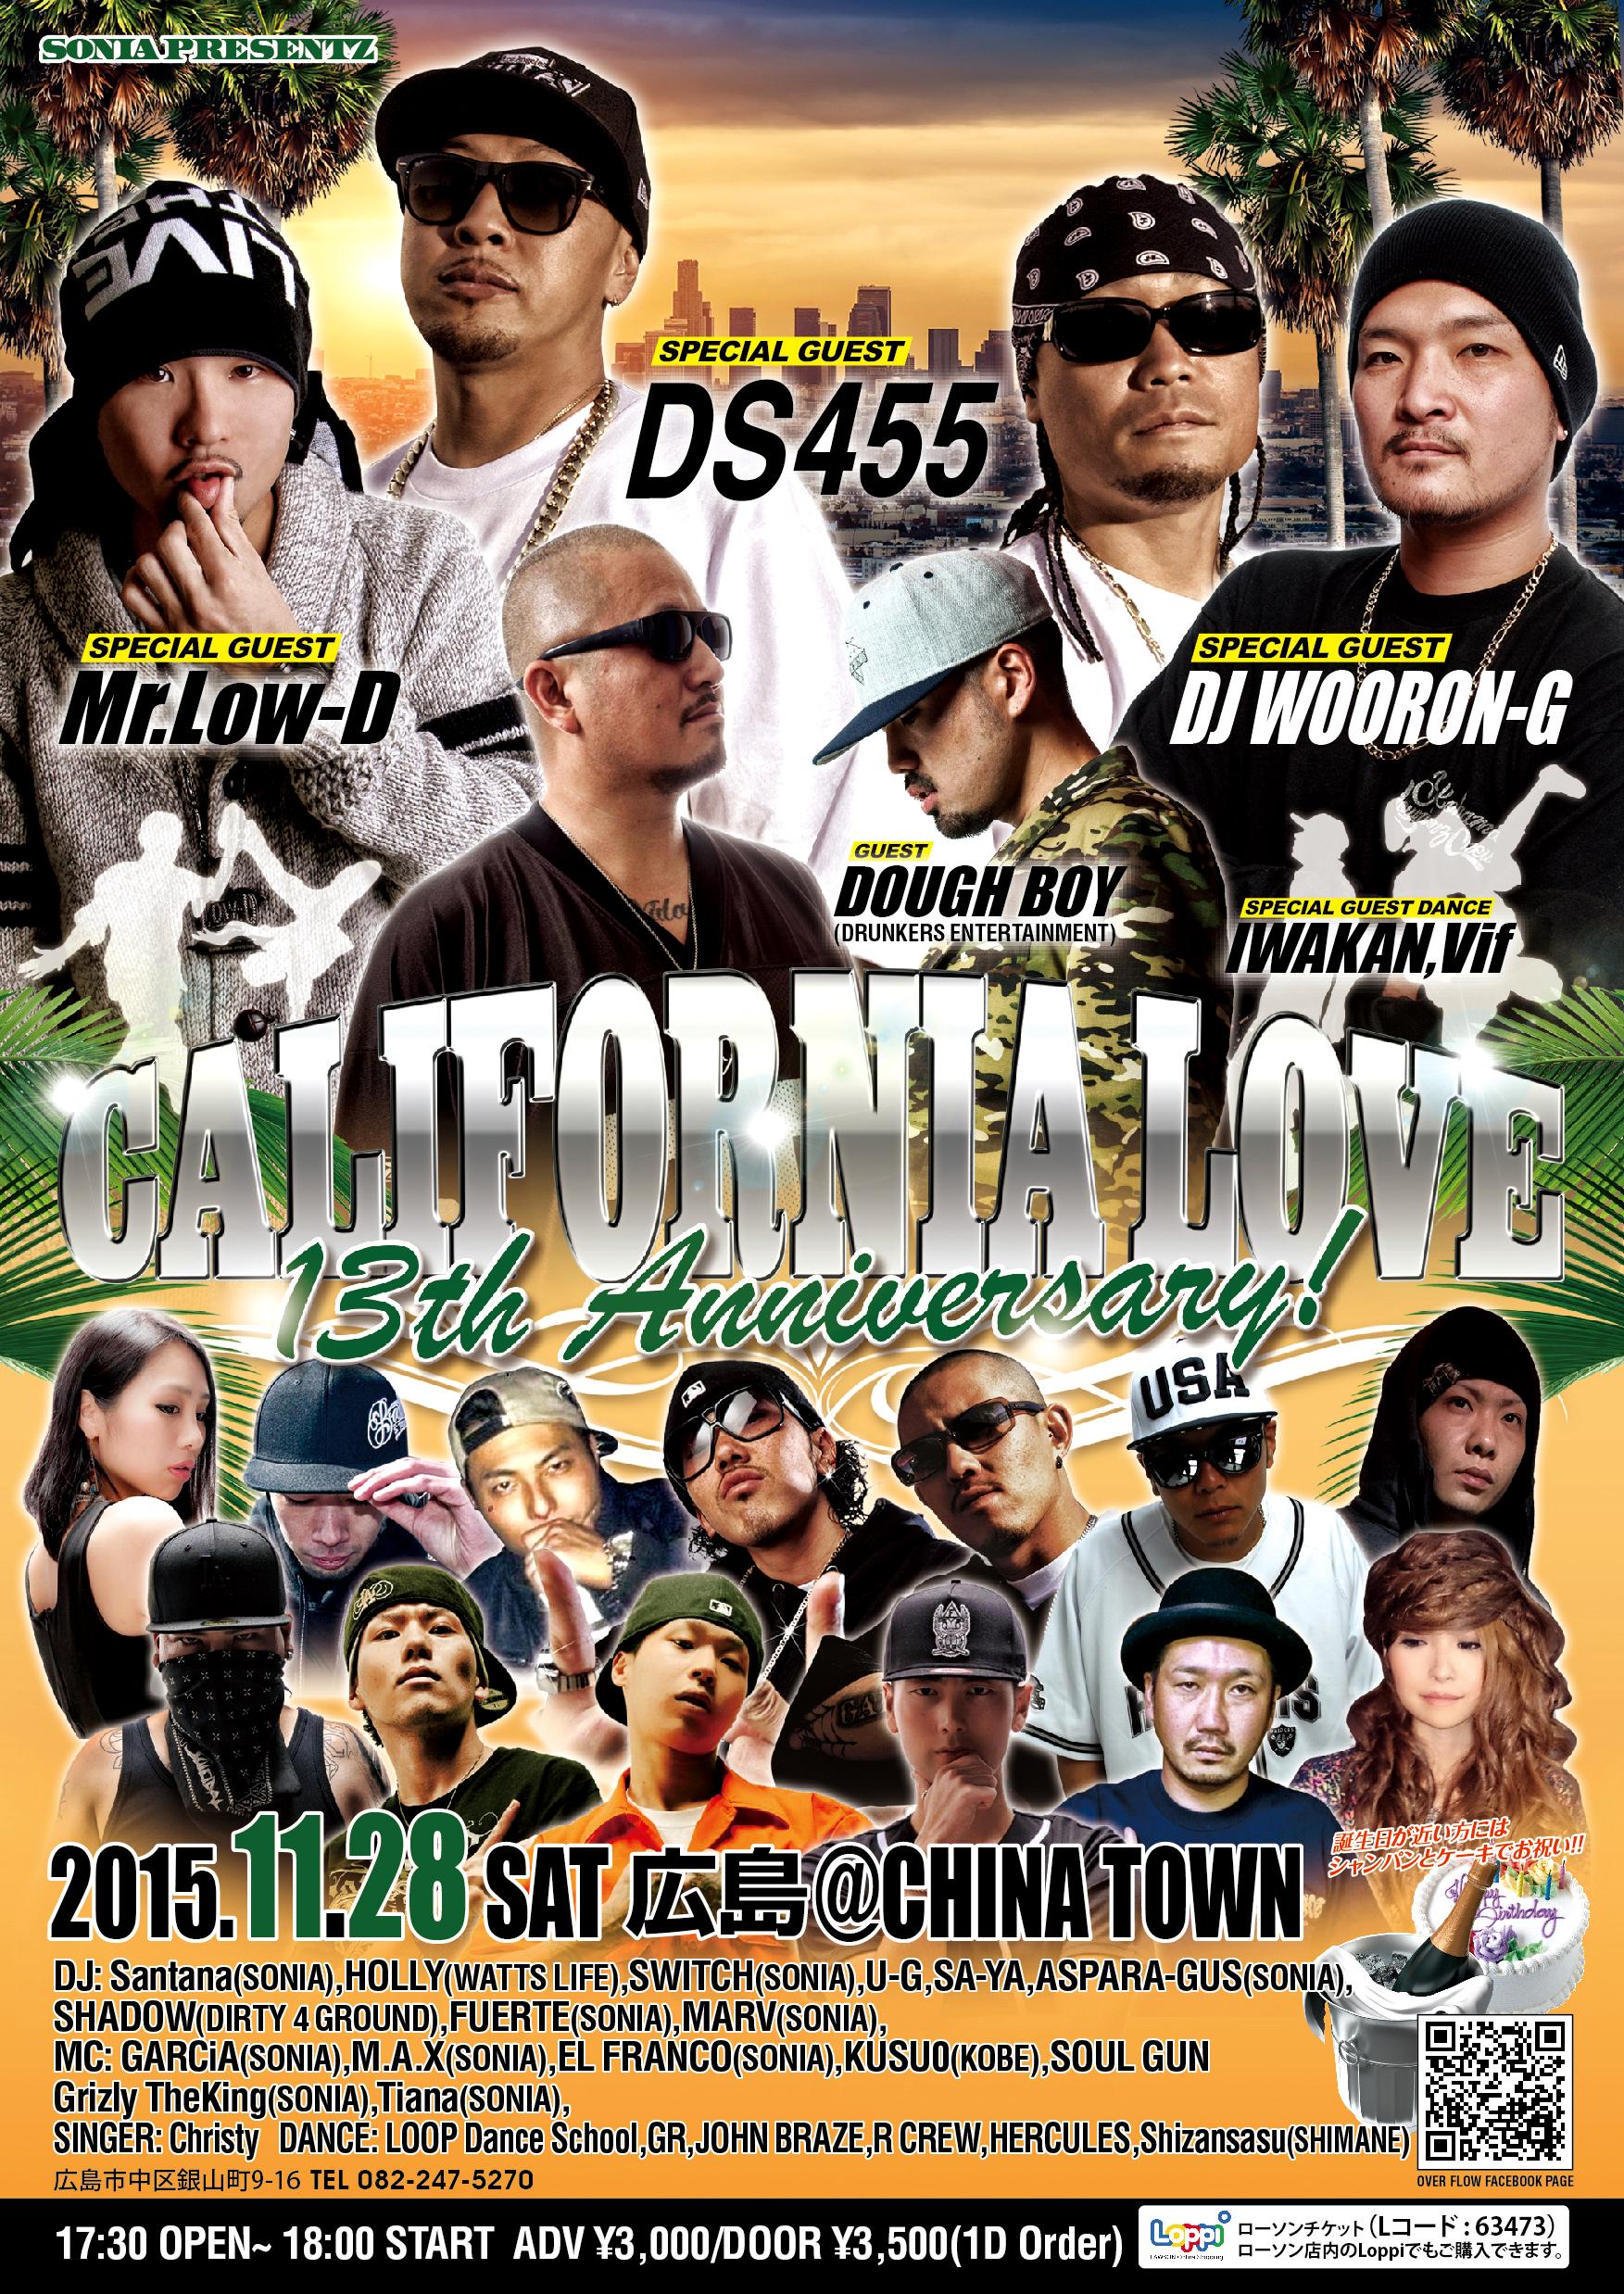 11月28日(土)「CALIFORNIA LOVE13th Anniversary」@広島県広島市 club CHINATOWN